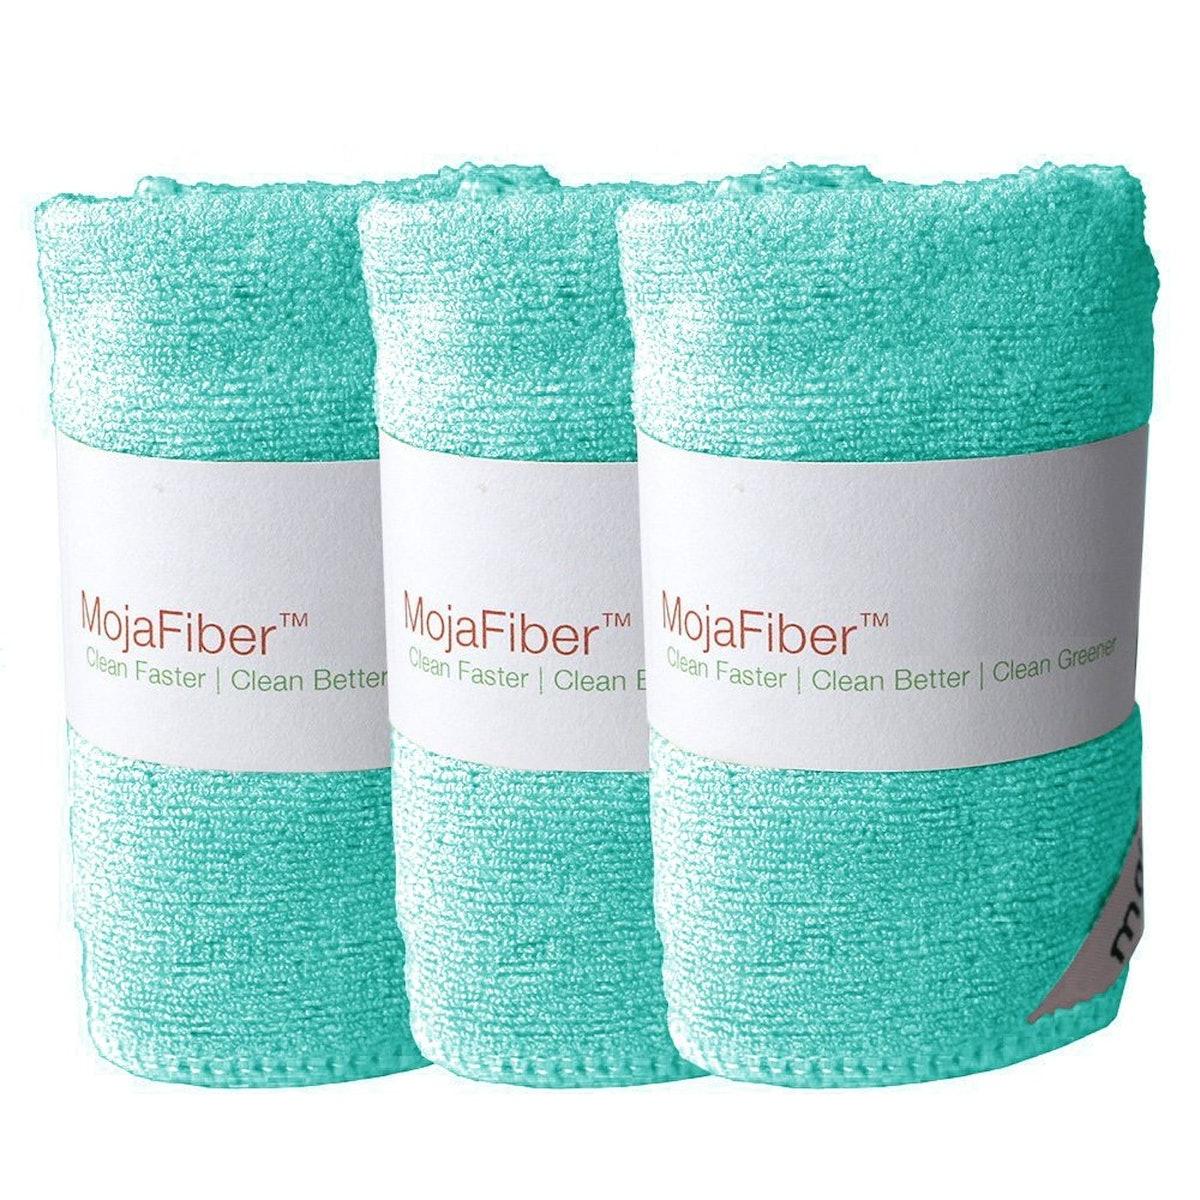 MojaFiber Microfiber Facial Cleansing Cloths (3 Pack)